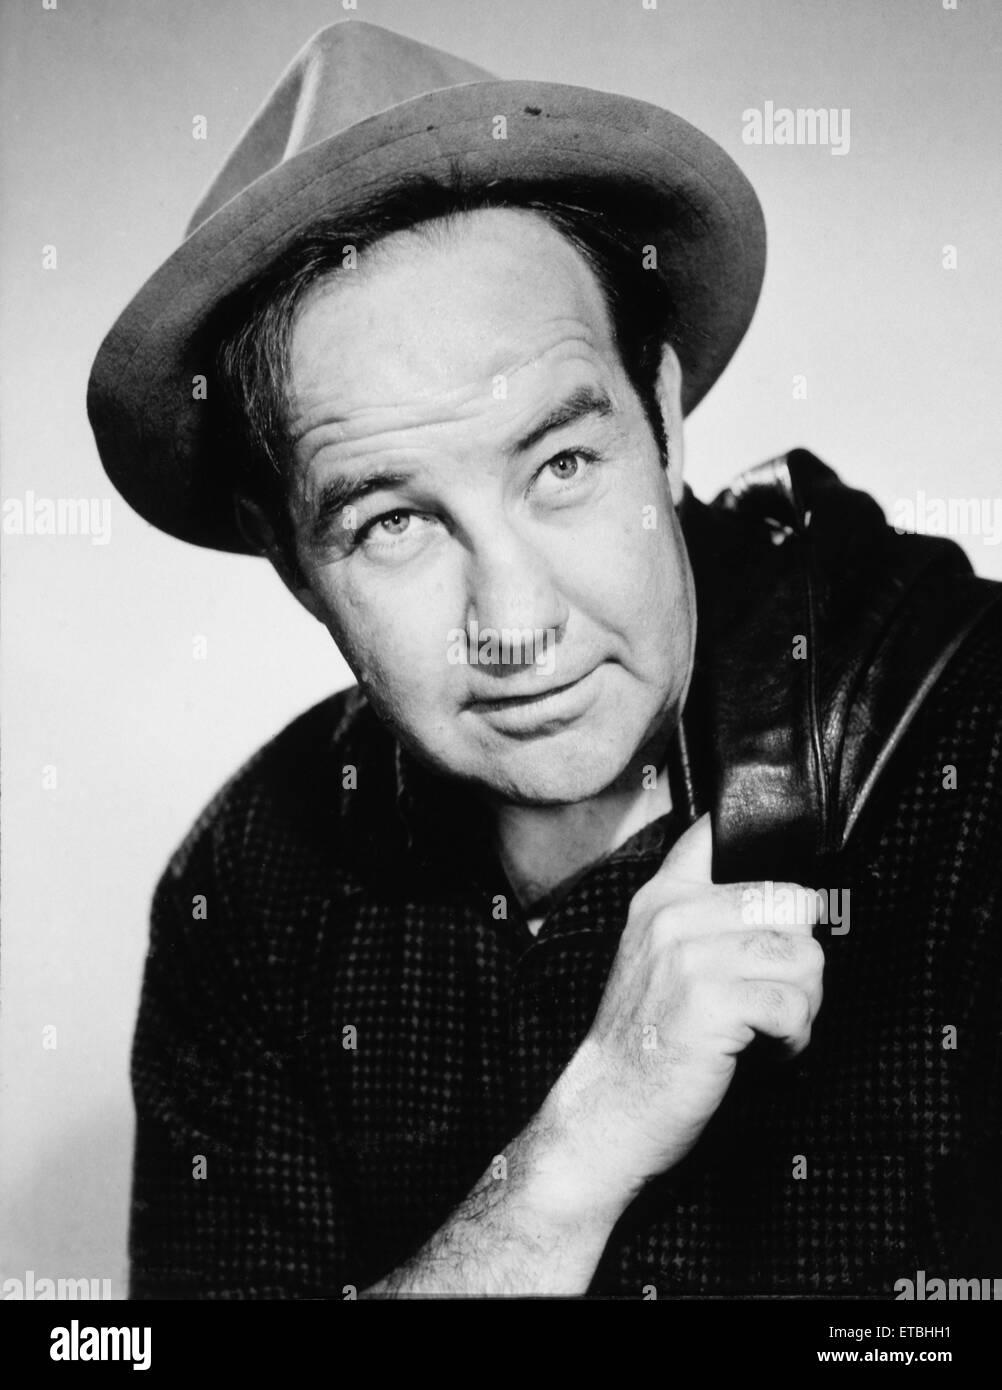 Actor Broderick Crawford, Publicity Portrait, 1949 - Stock Image